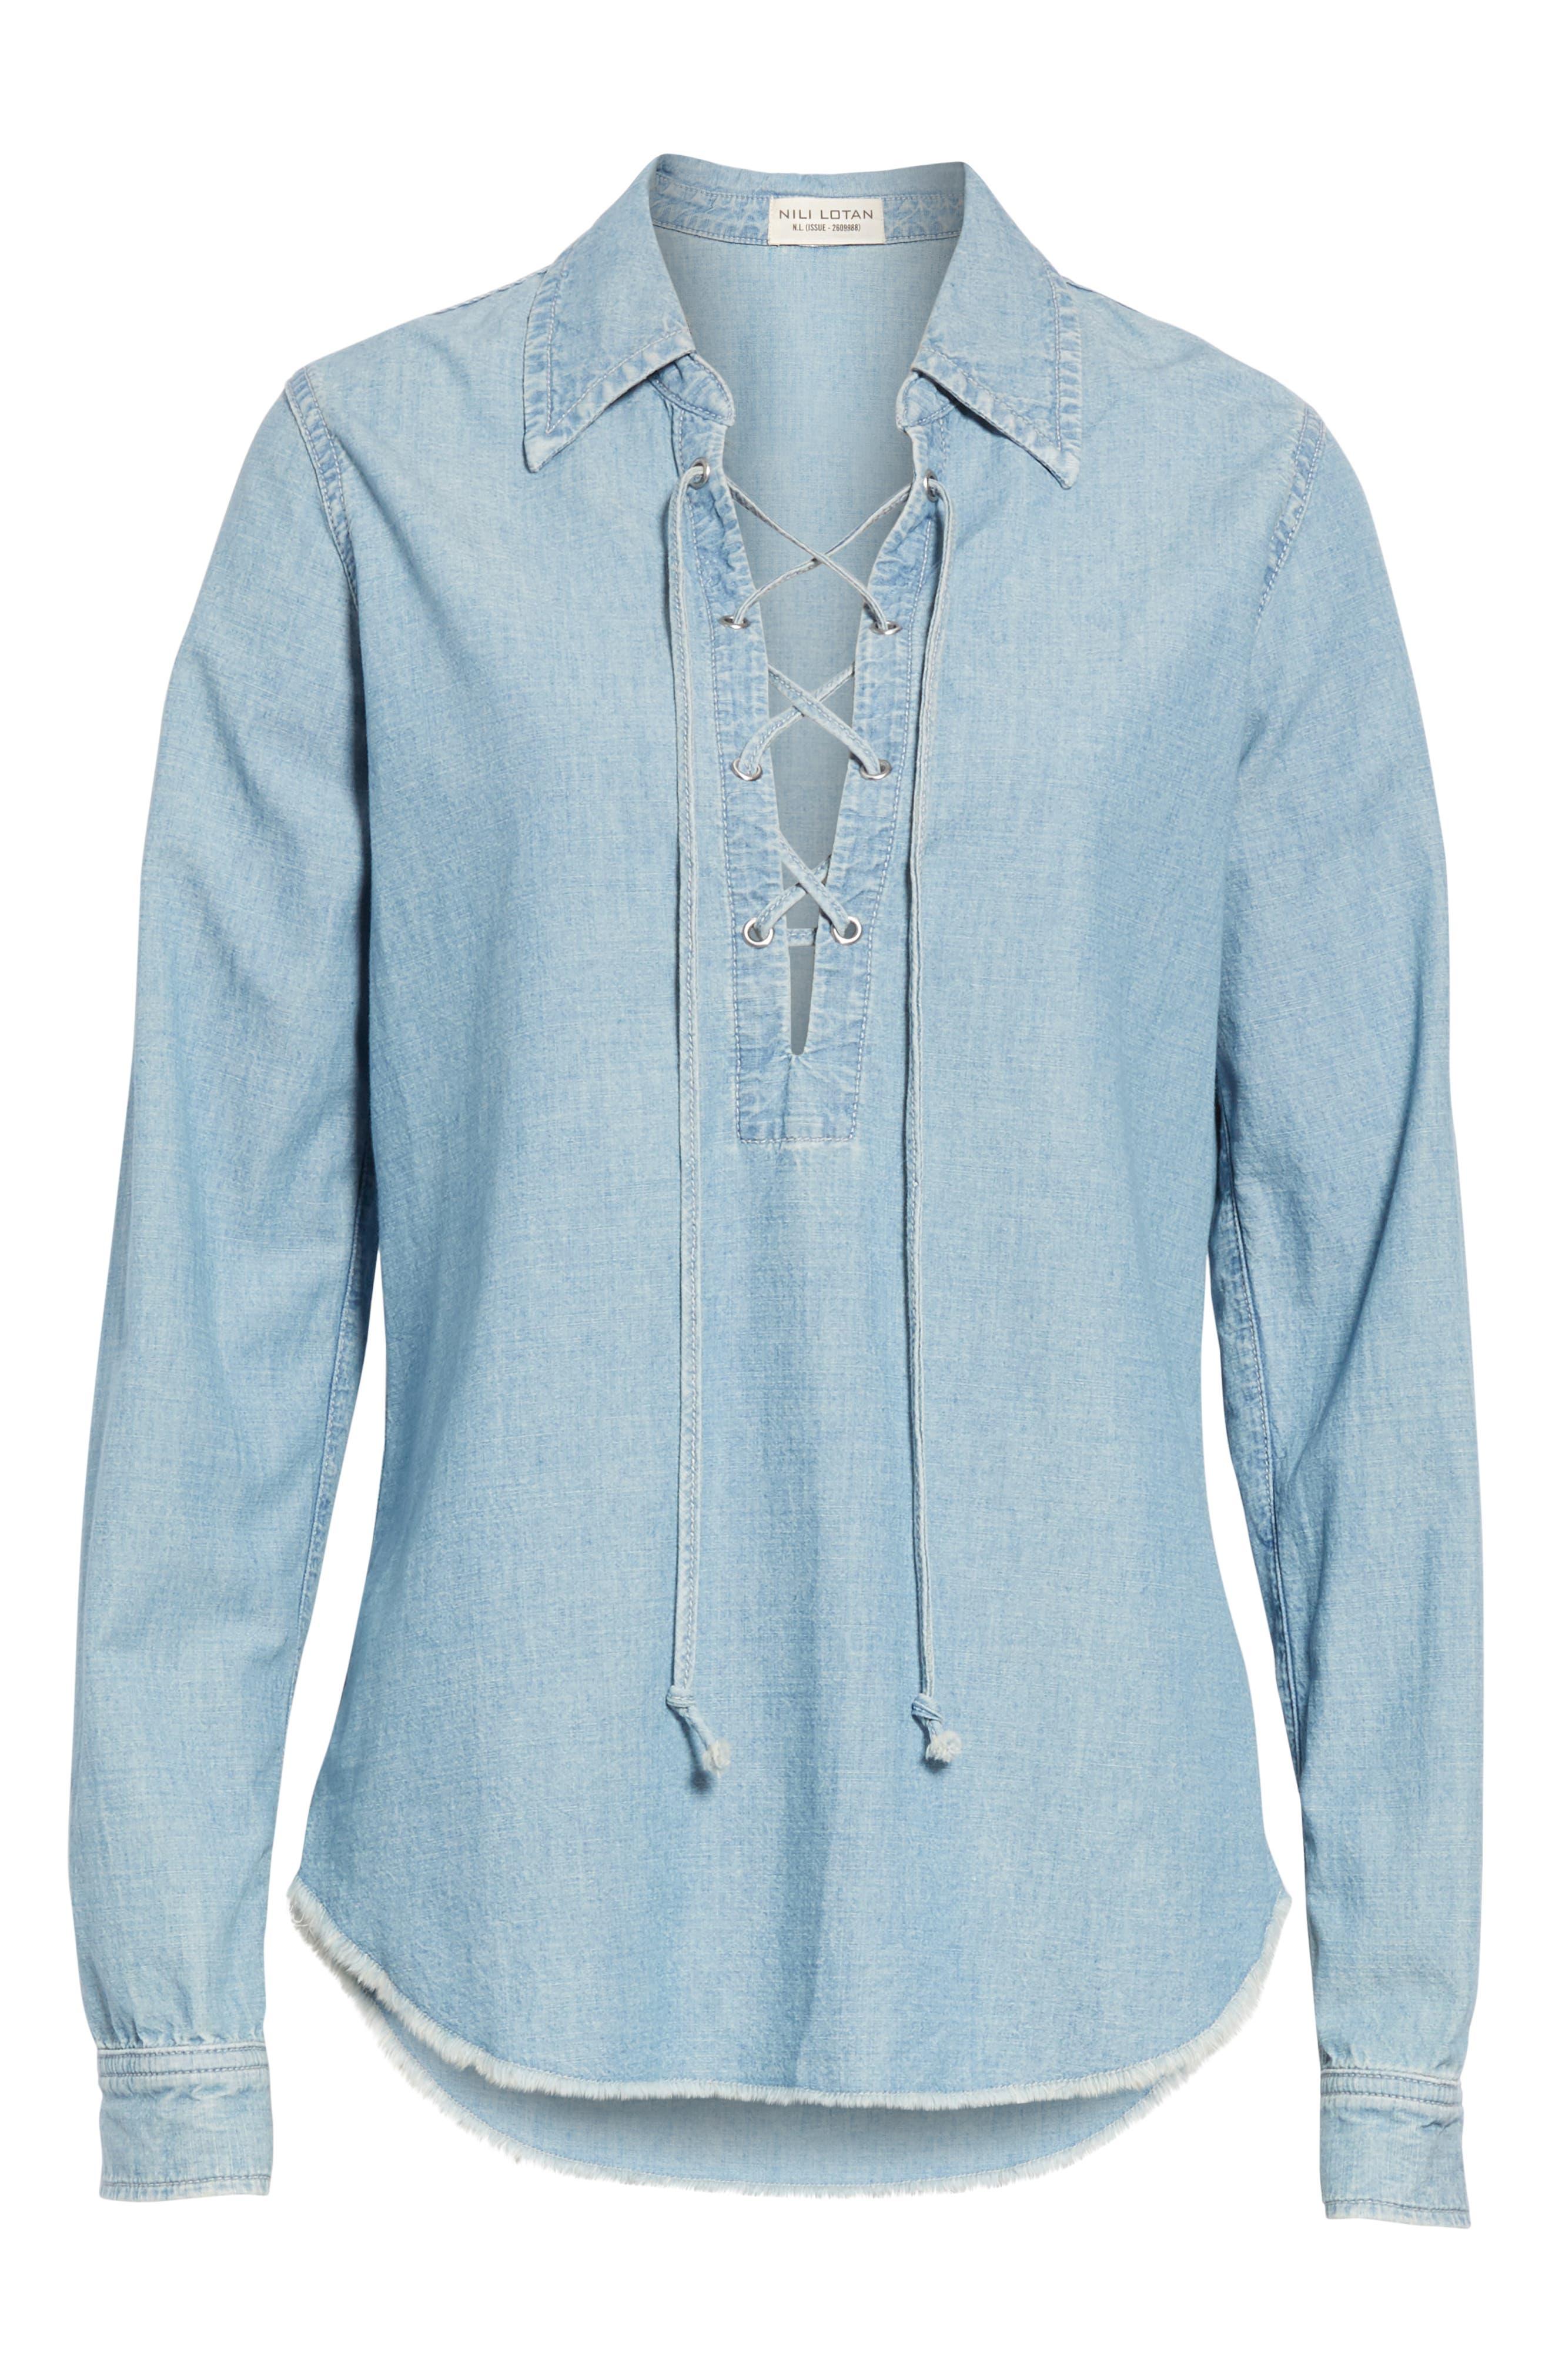 NILI LOTAN, Mallory Chambray Shirt, Alternate thumbnail 6, color, SKY BLUE